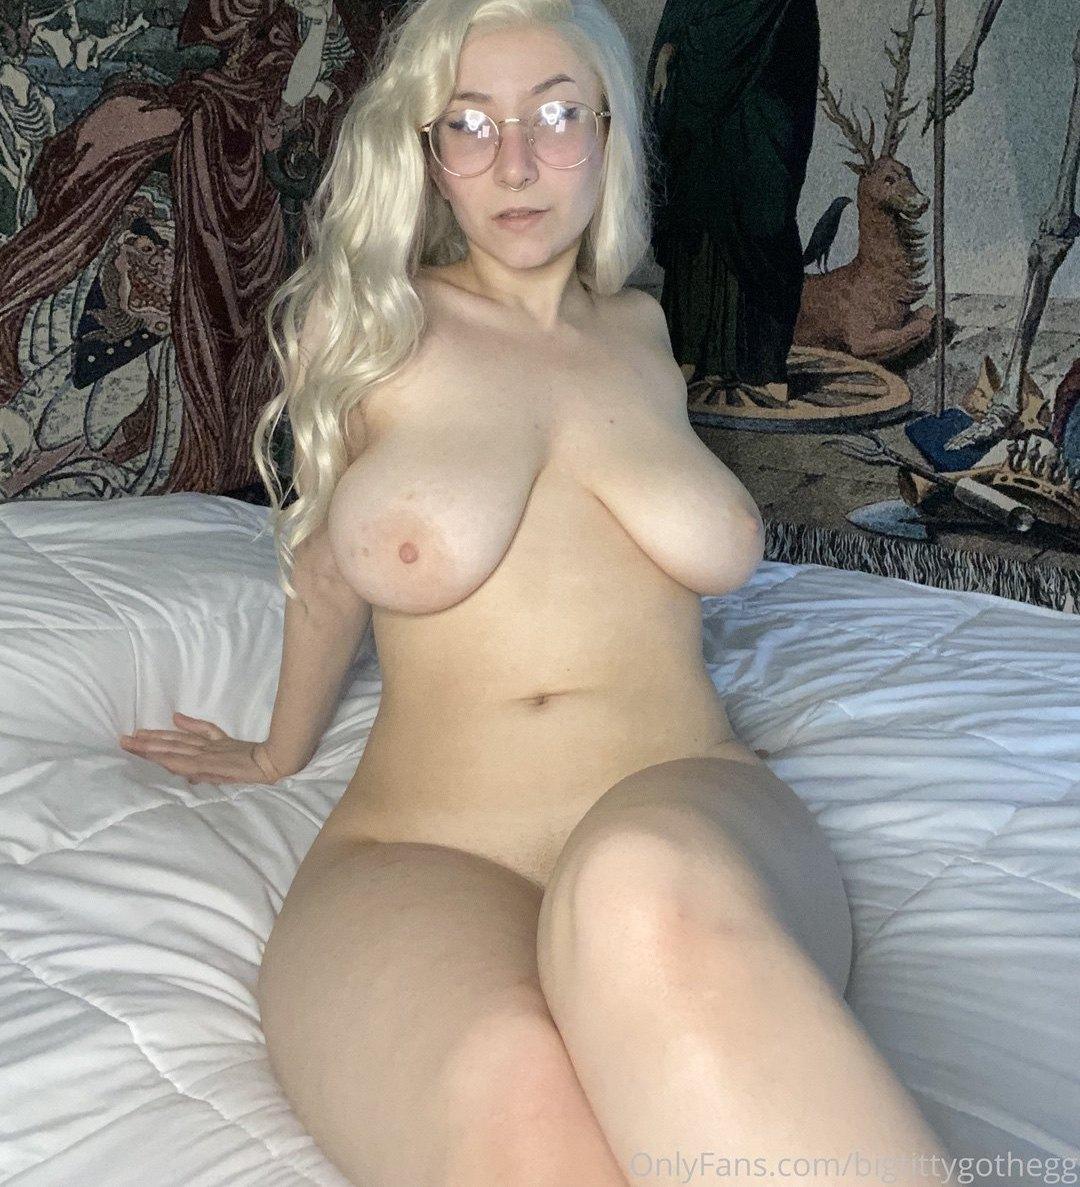 Lee Bigtittygothegg Onlyfans Nudes Leaks 0017